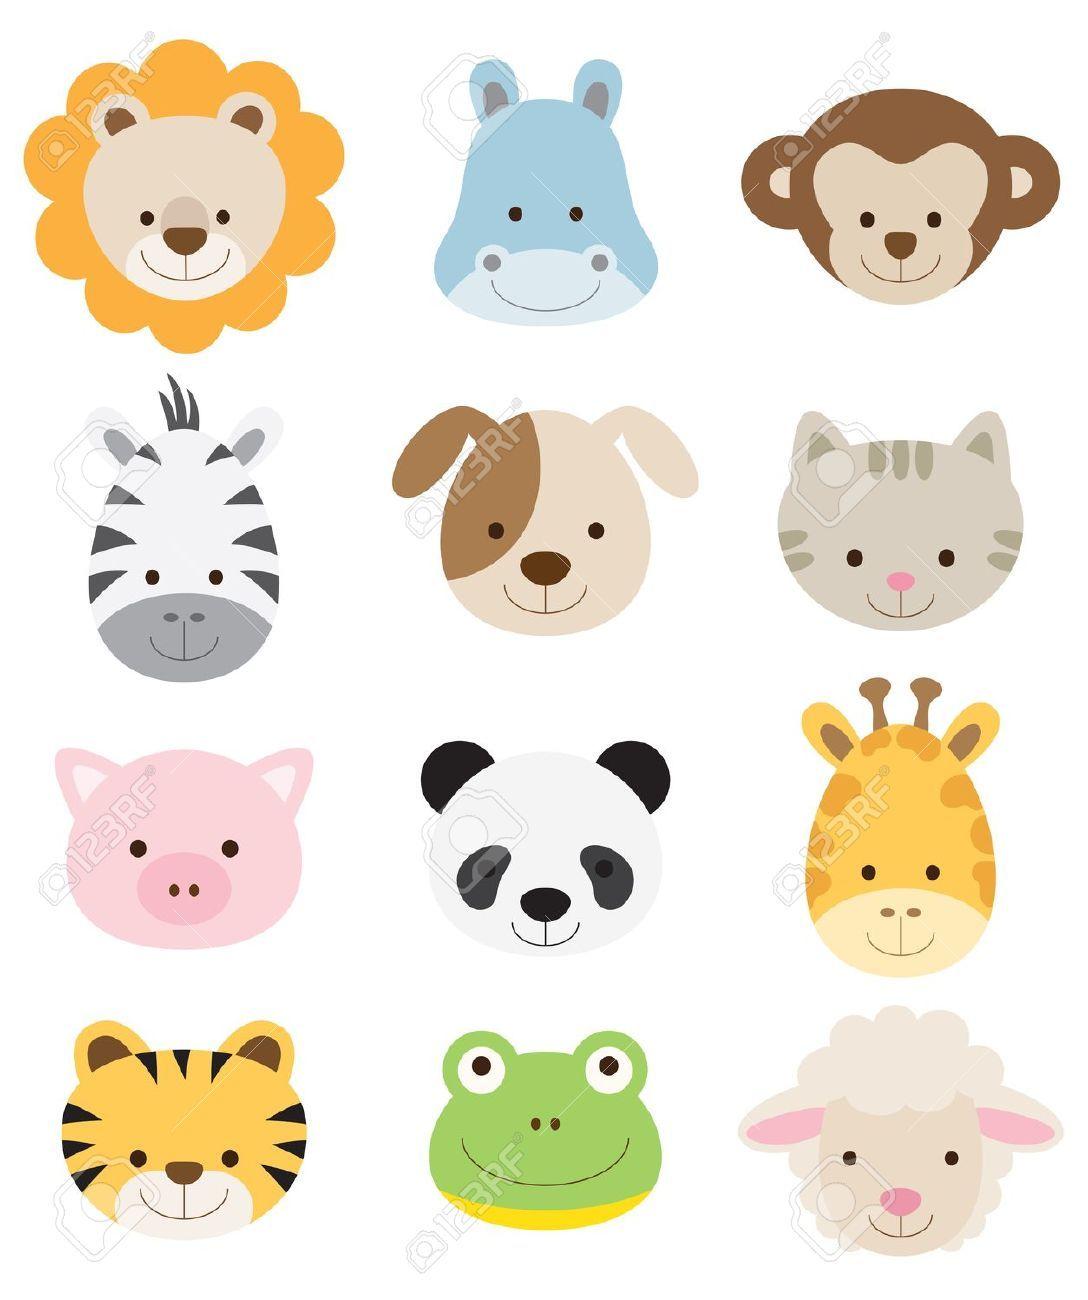 Vector Illustration Of Animal Faces Including Lion Hippo Monkey Zebra Dog  Cat Pig Panda Giraffe Tige Stock Vector. Felt Animals, Baby ...